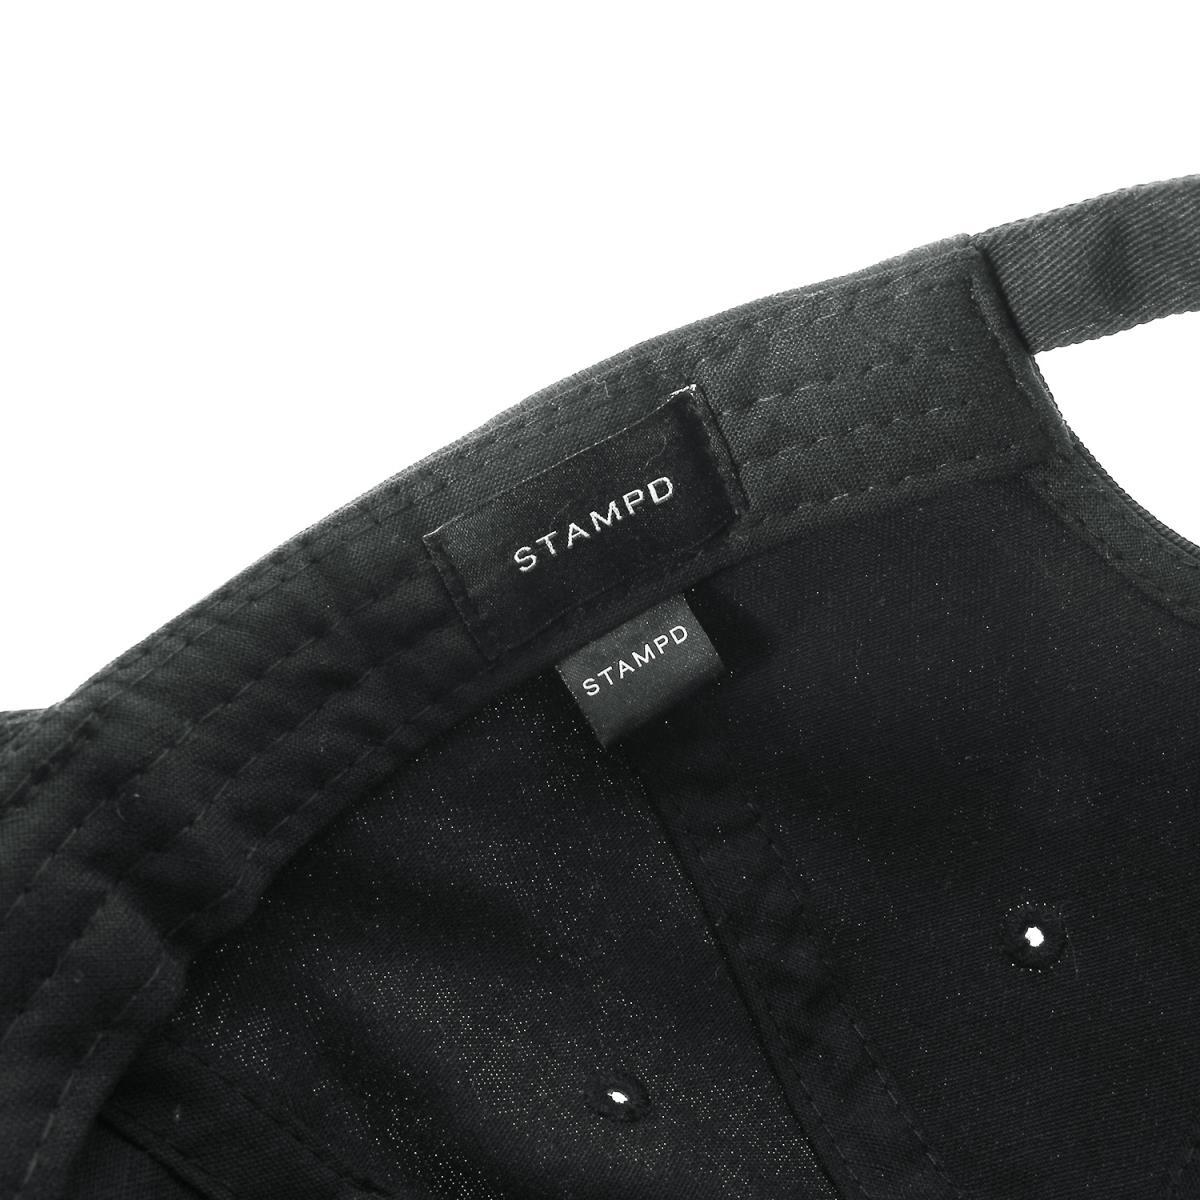 5f32edf4d21 STAMPD (スタンプド) 18S S brand logo embroidery 6 panel cap (SCRIPT DAD HAT)  black